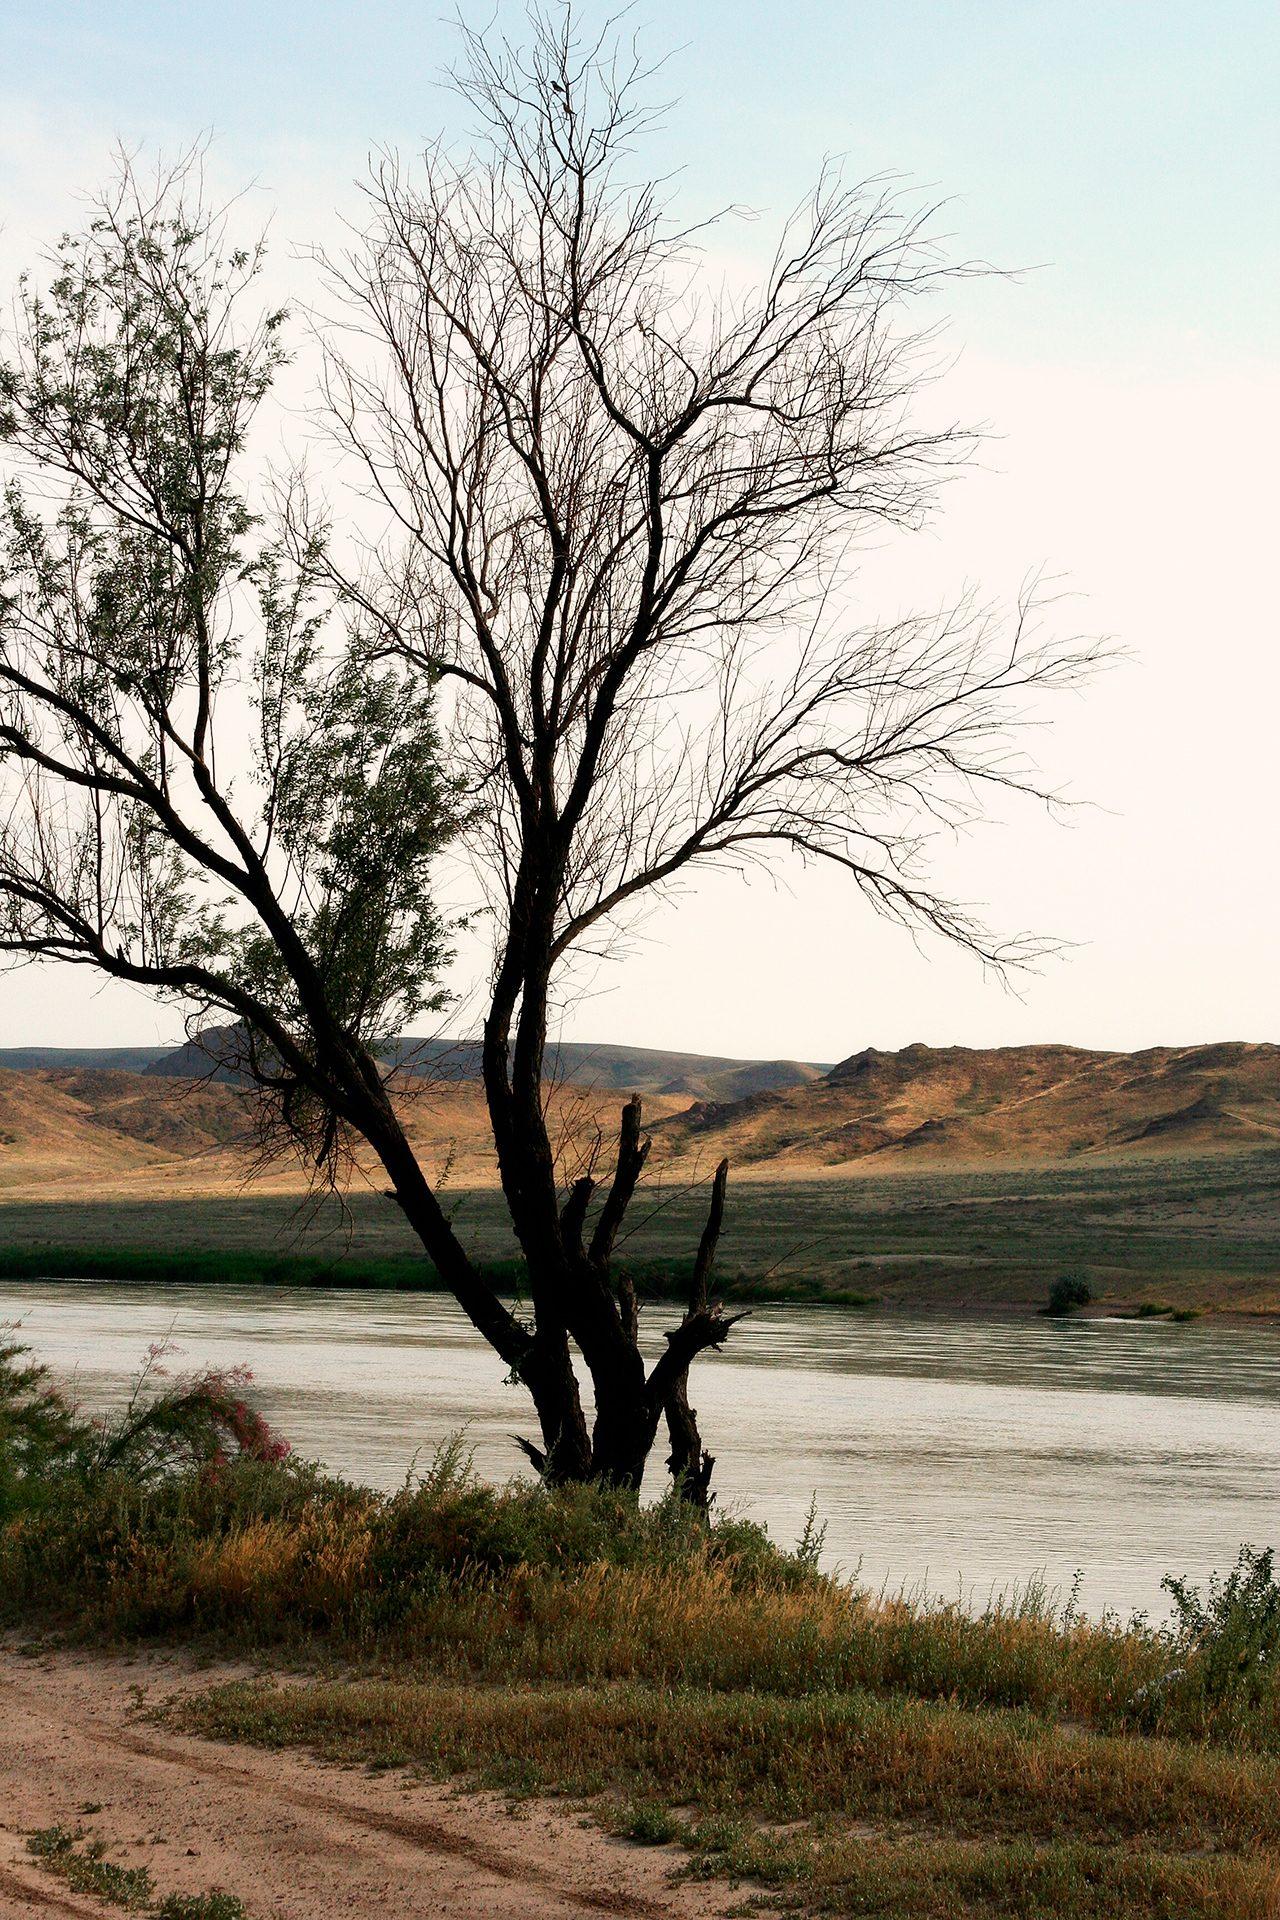 An old tree, Ili river, Almaty area, Kazakhstan, nature, steppe